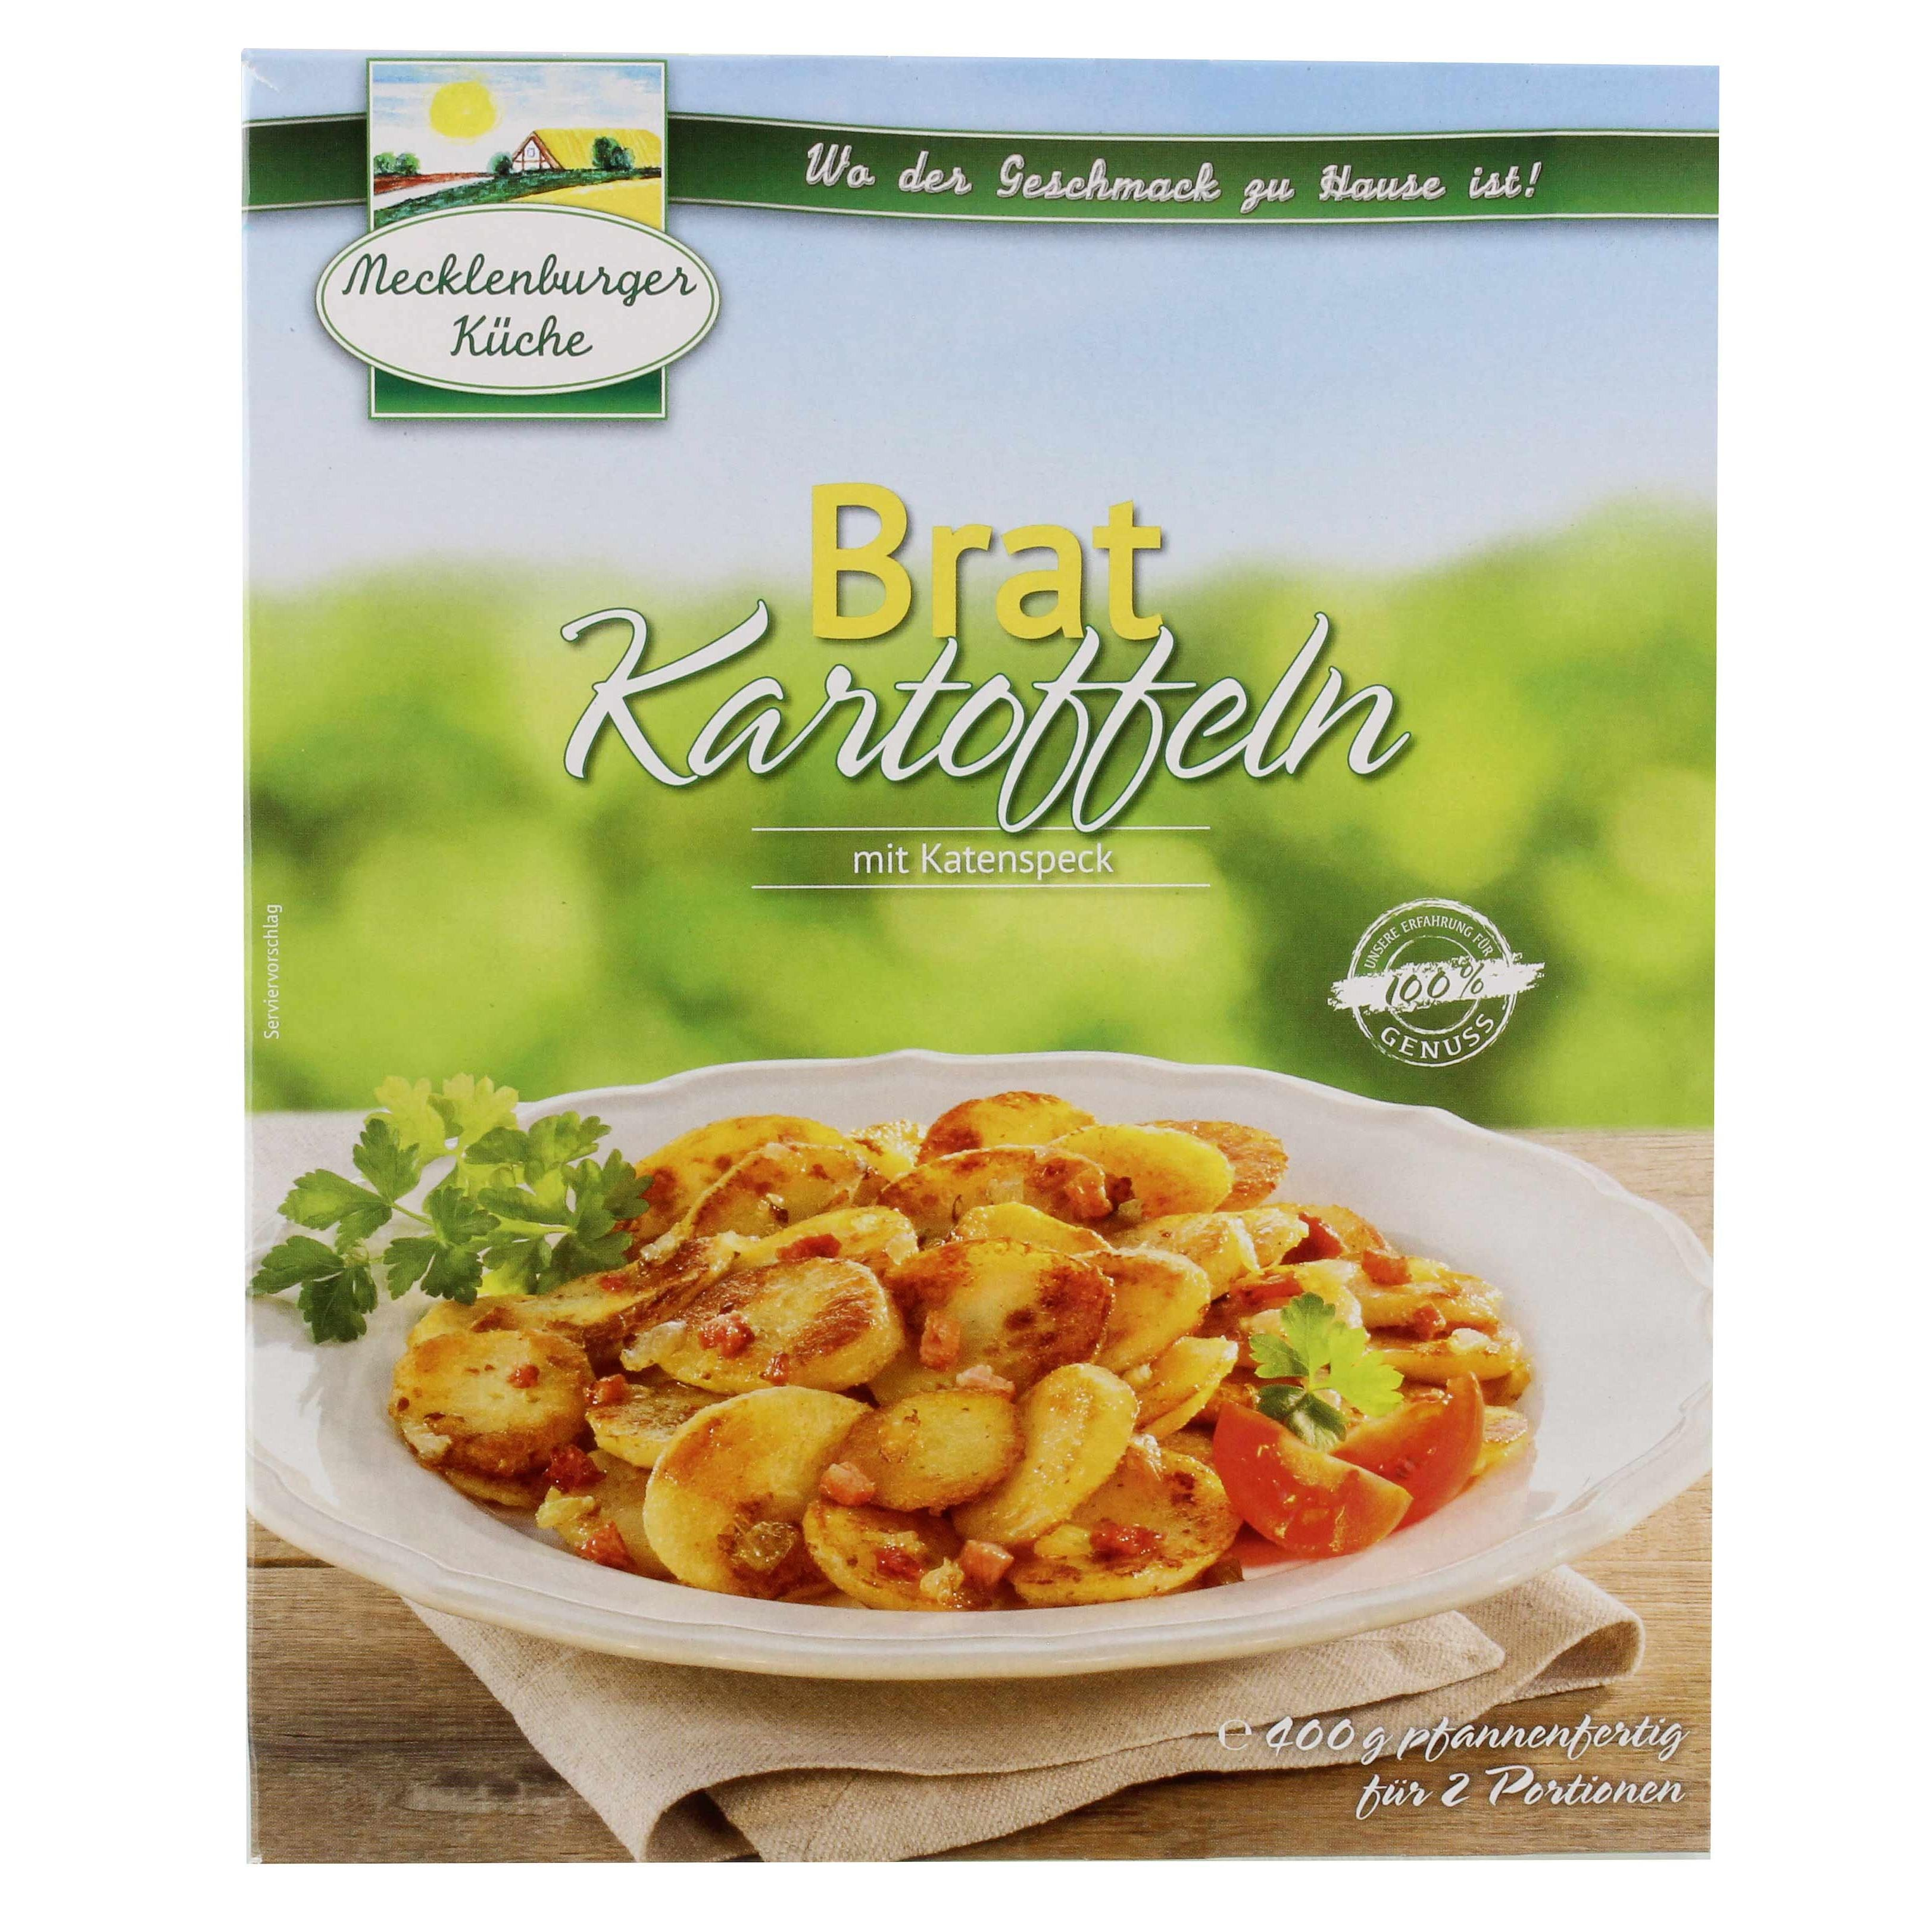 Mecklenburger - Bratkartoffeln mit Katenspeck Fertiggericht - 400g